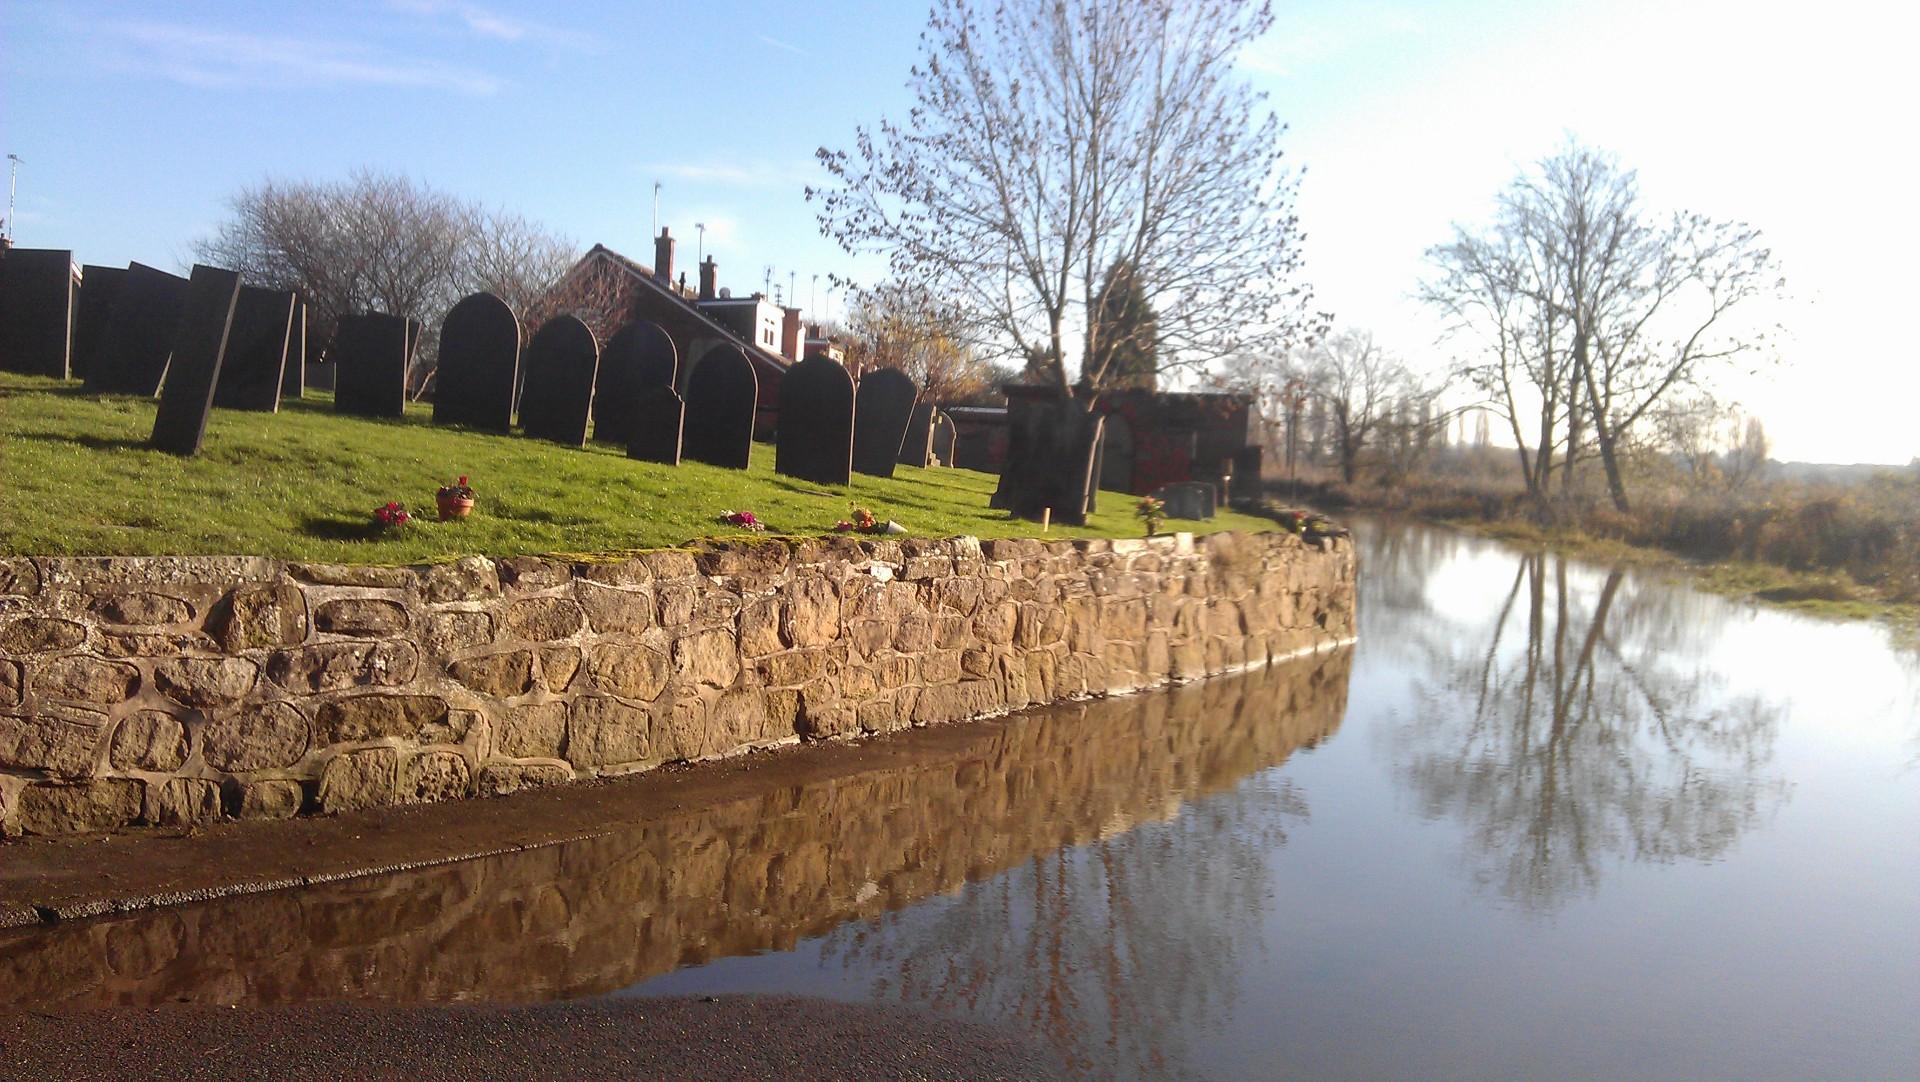 Flooding near River Trent